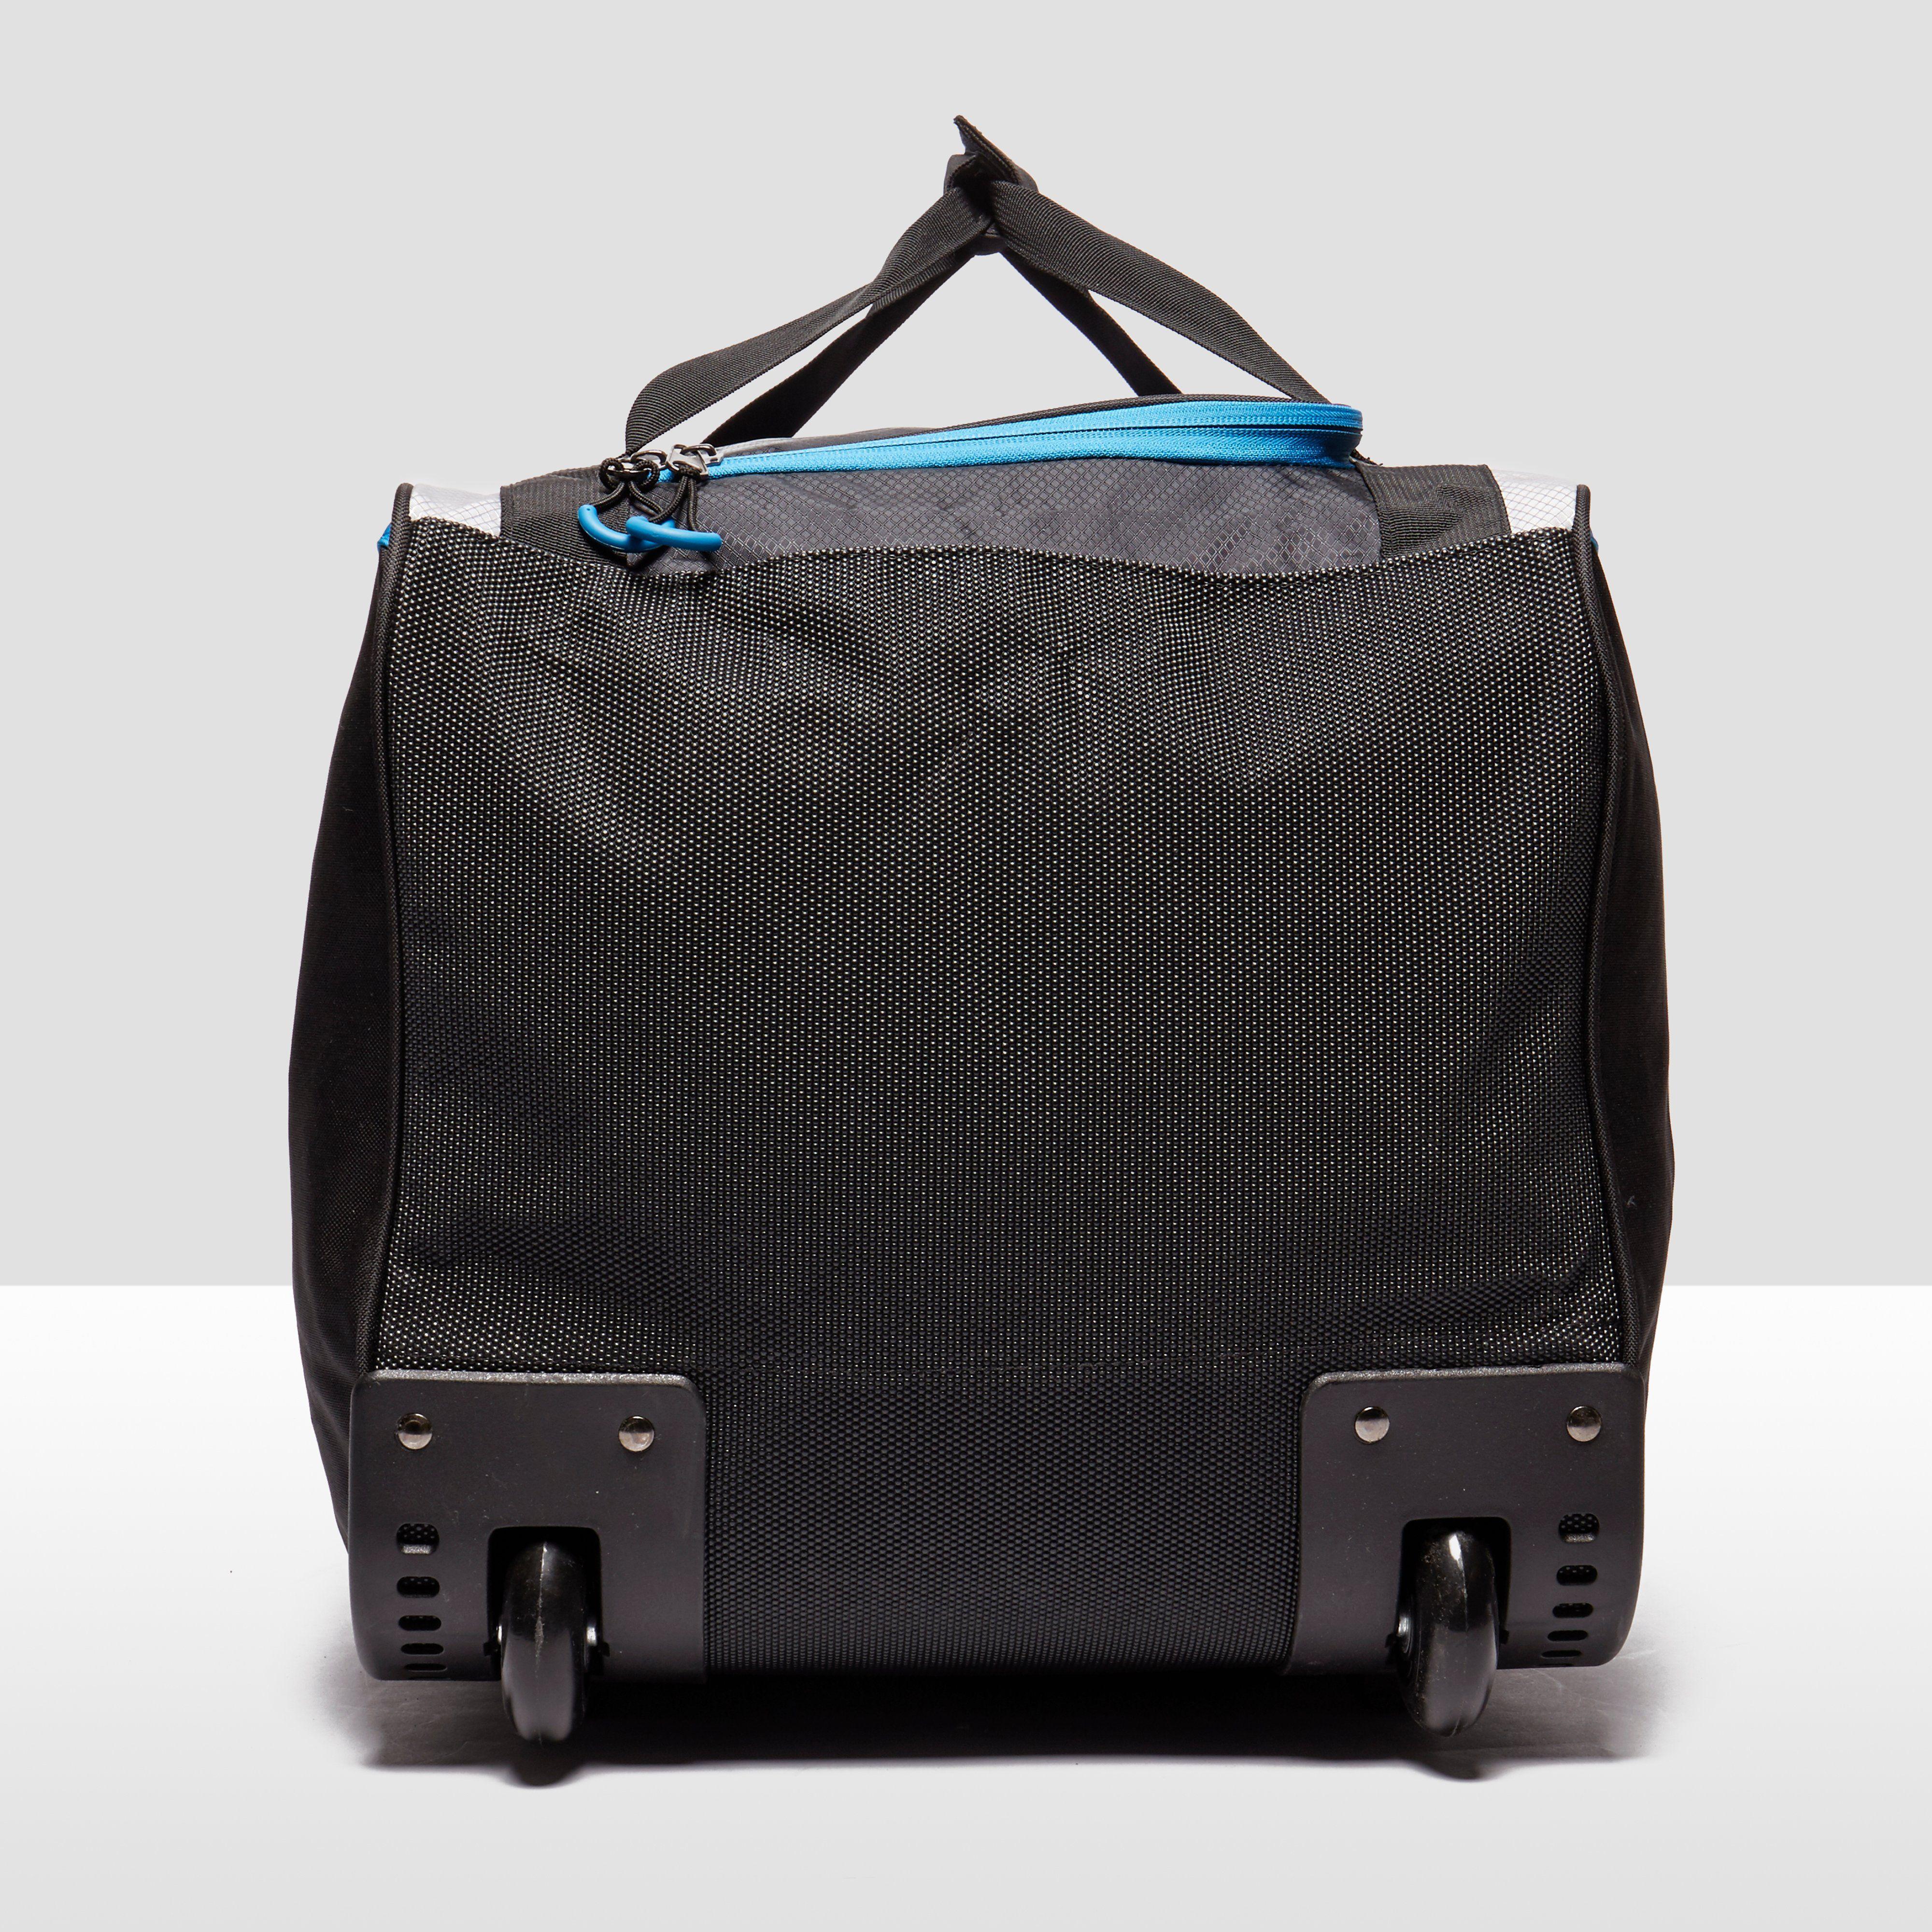 Gray-Nicolls Powerbow 6 600 Cricket Bag